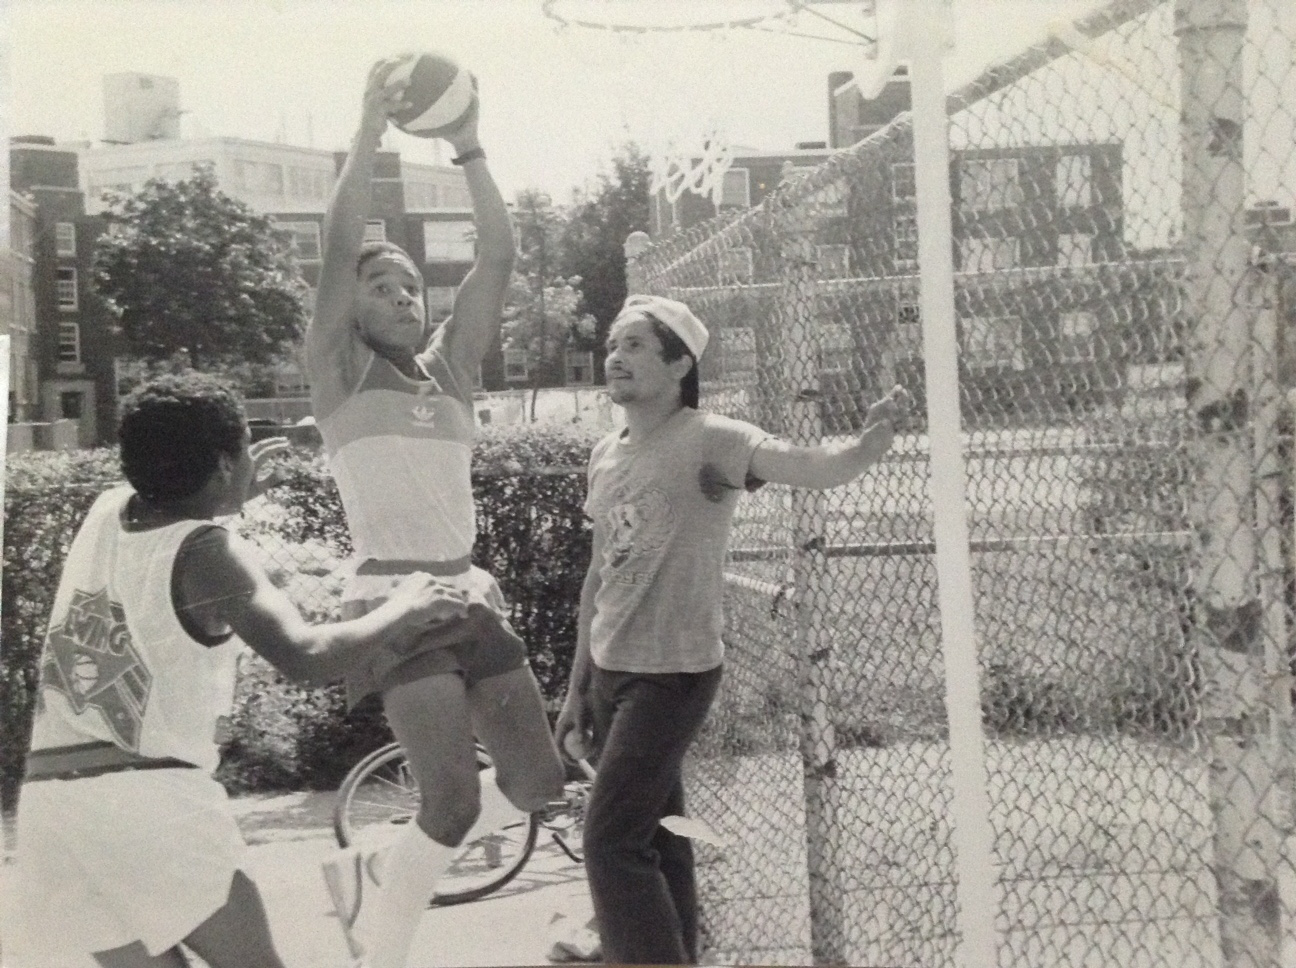 Tico Garcia (left) plays basketball with his twin, Daco Garcia, as Rainier Rosado looks on.